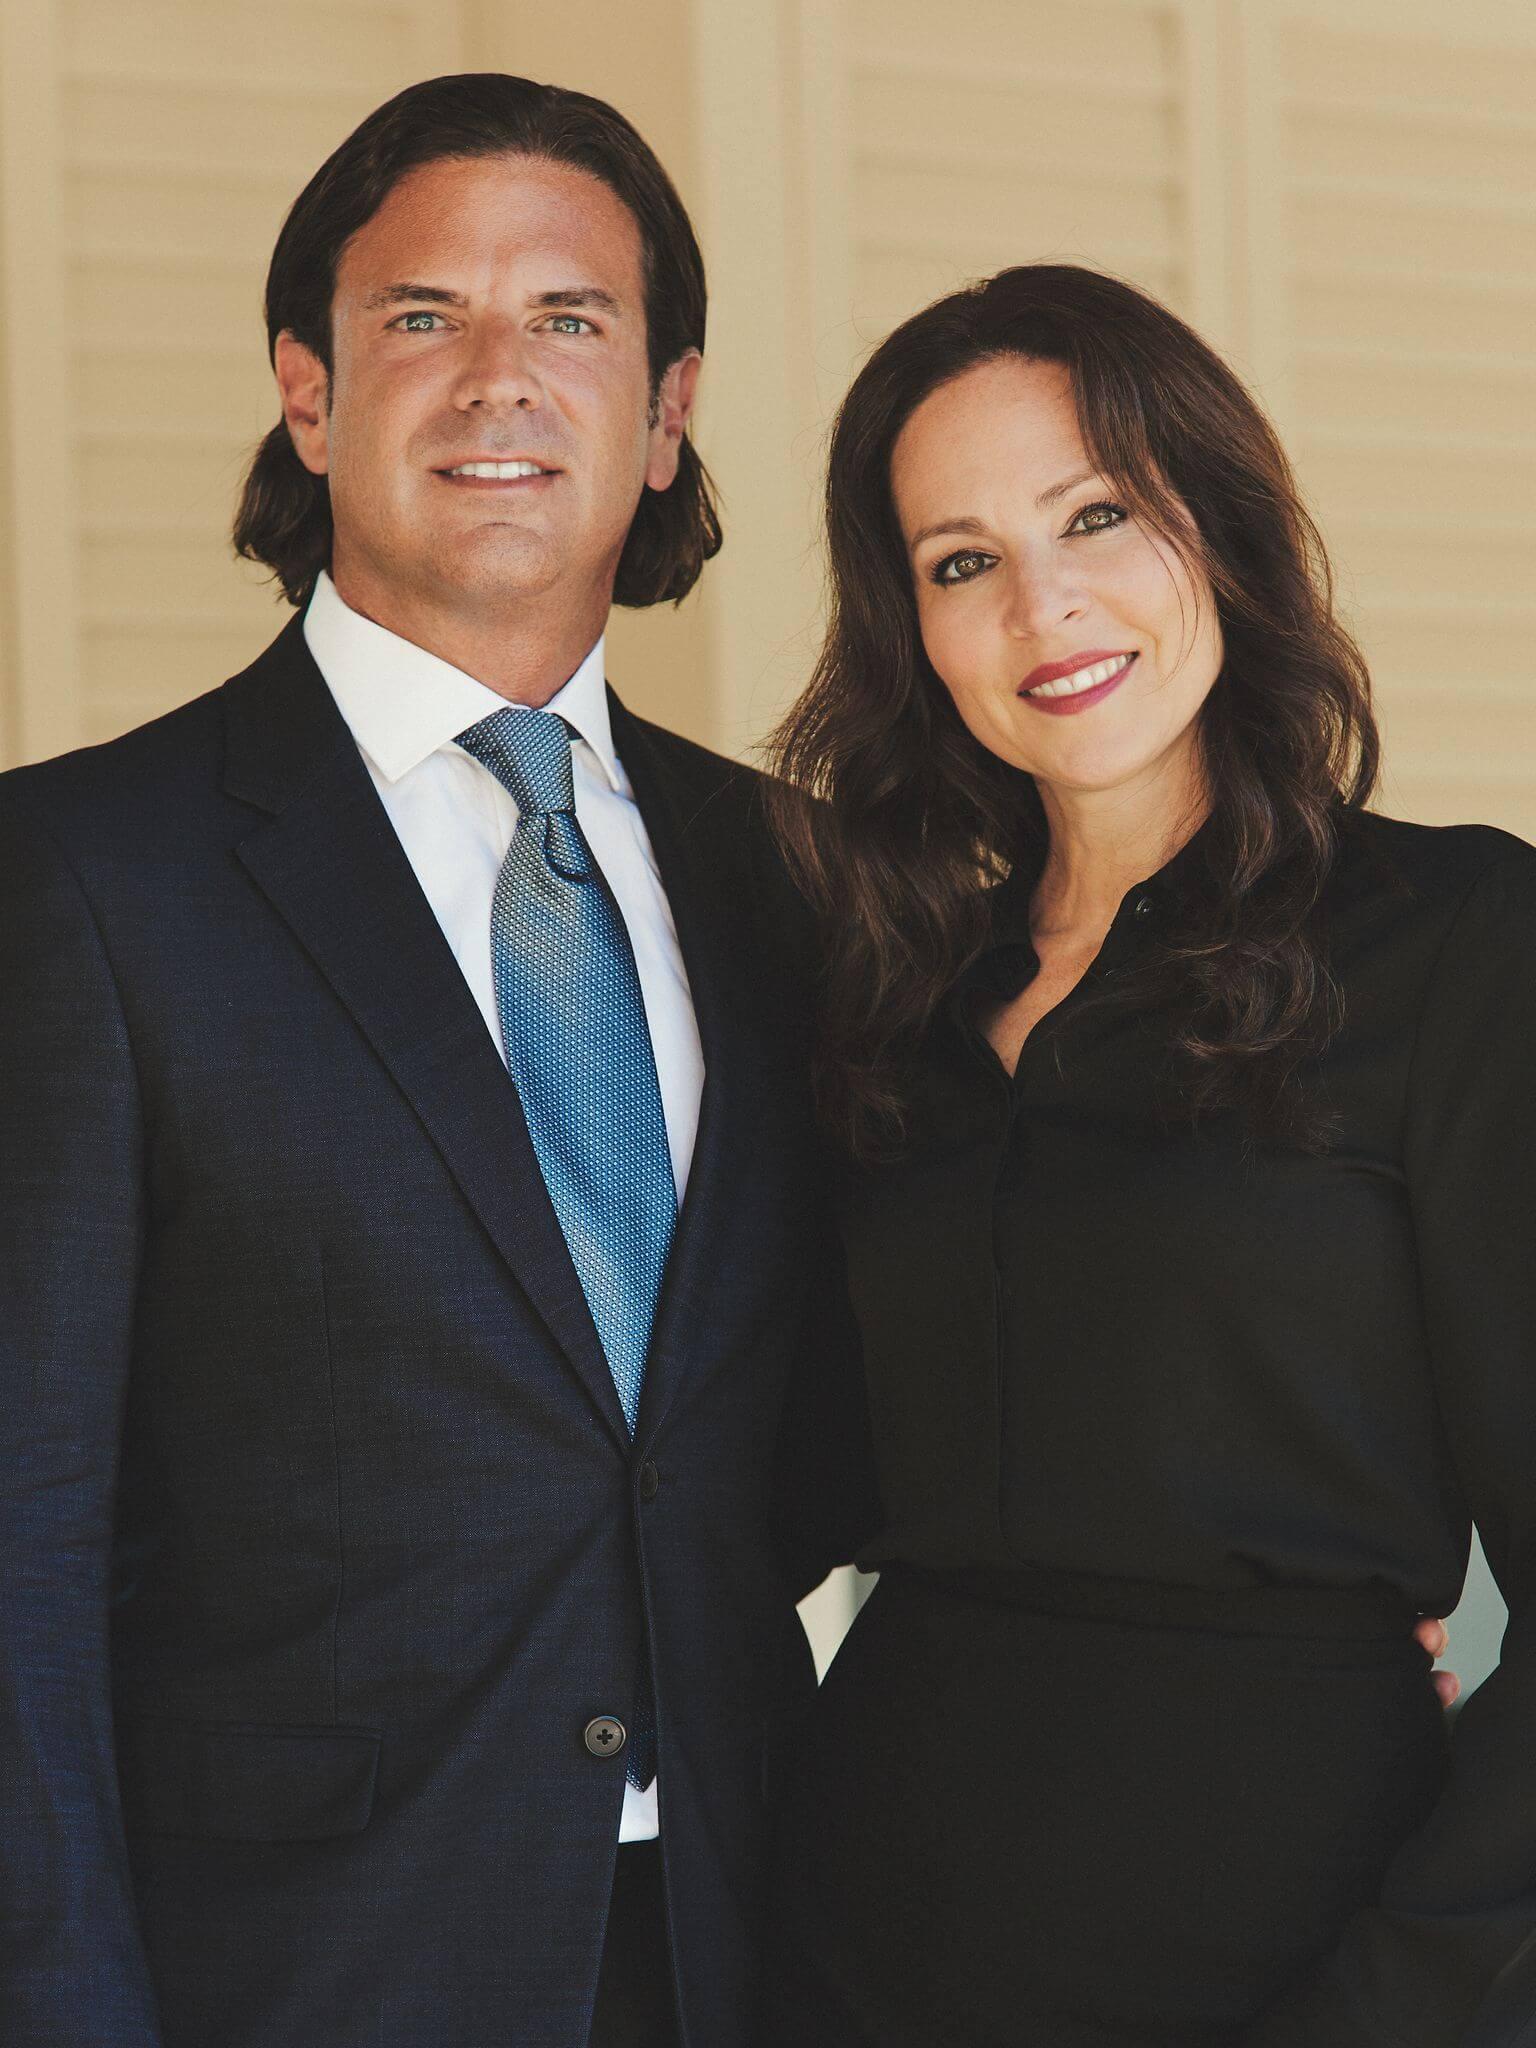 David adelman and wife